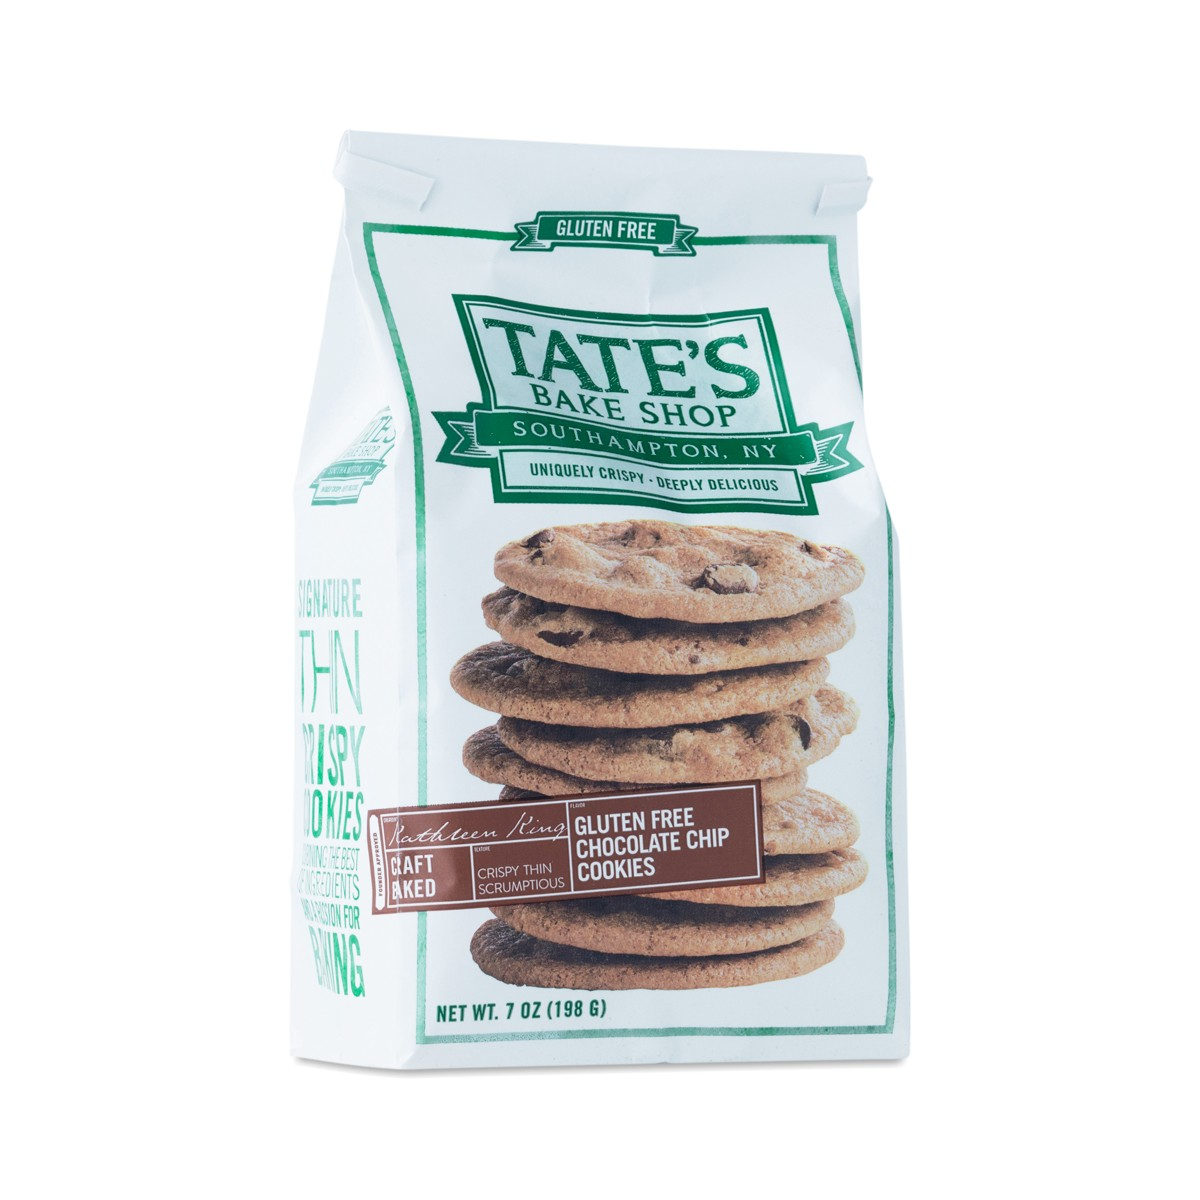 Tates Bake Shop Gluten-Free Chocolate Chip Cookies ...